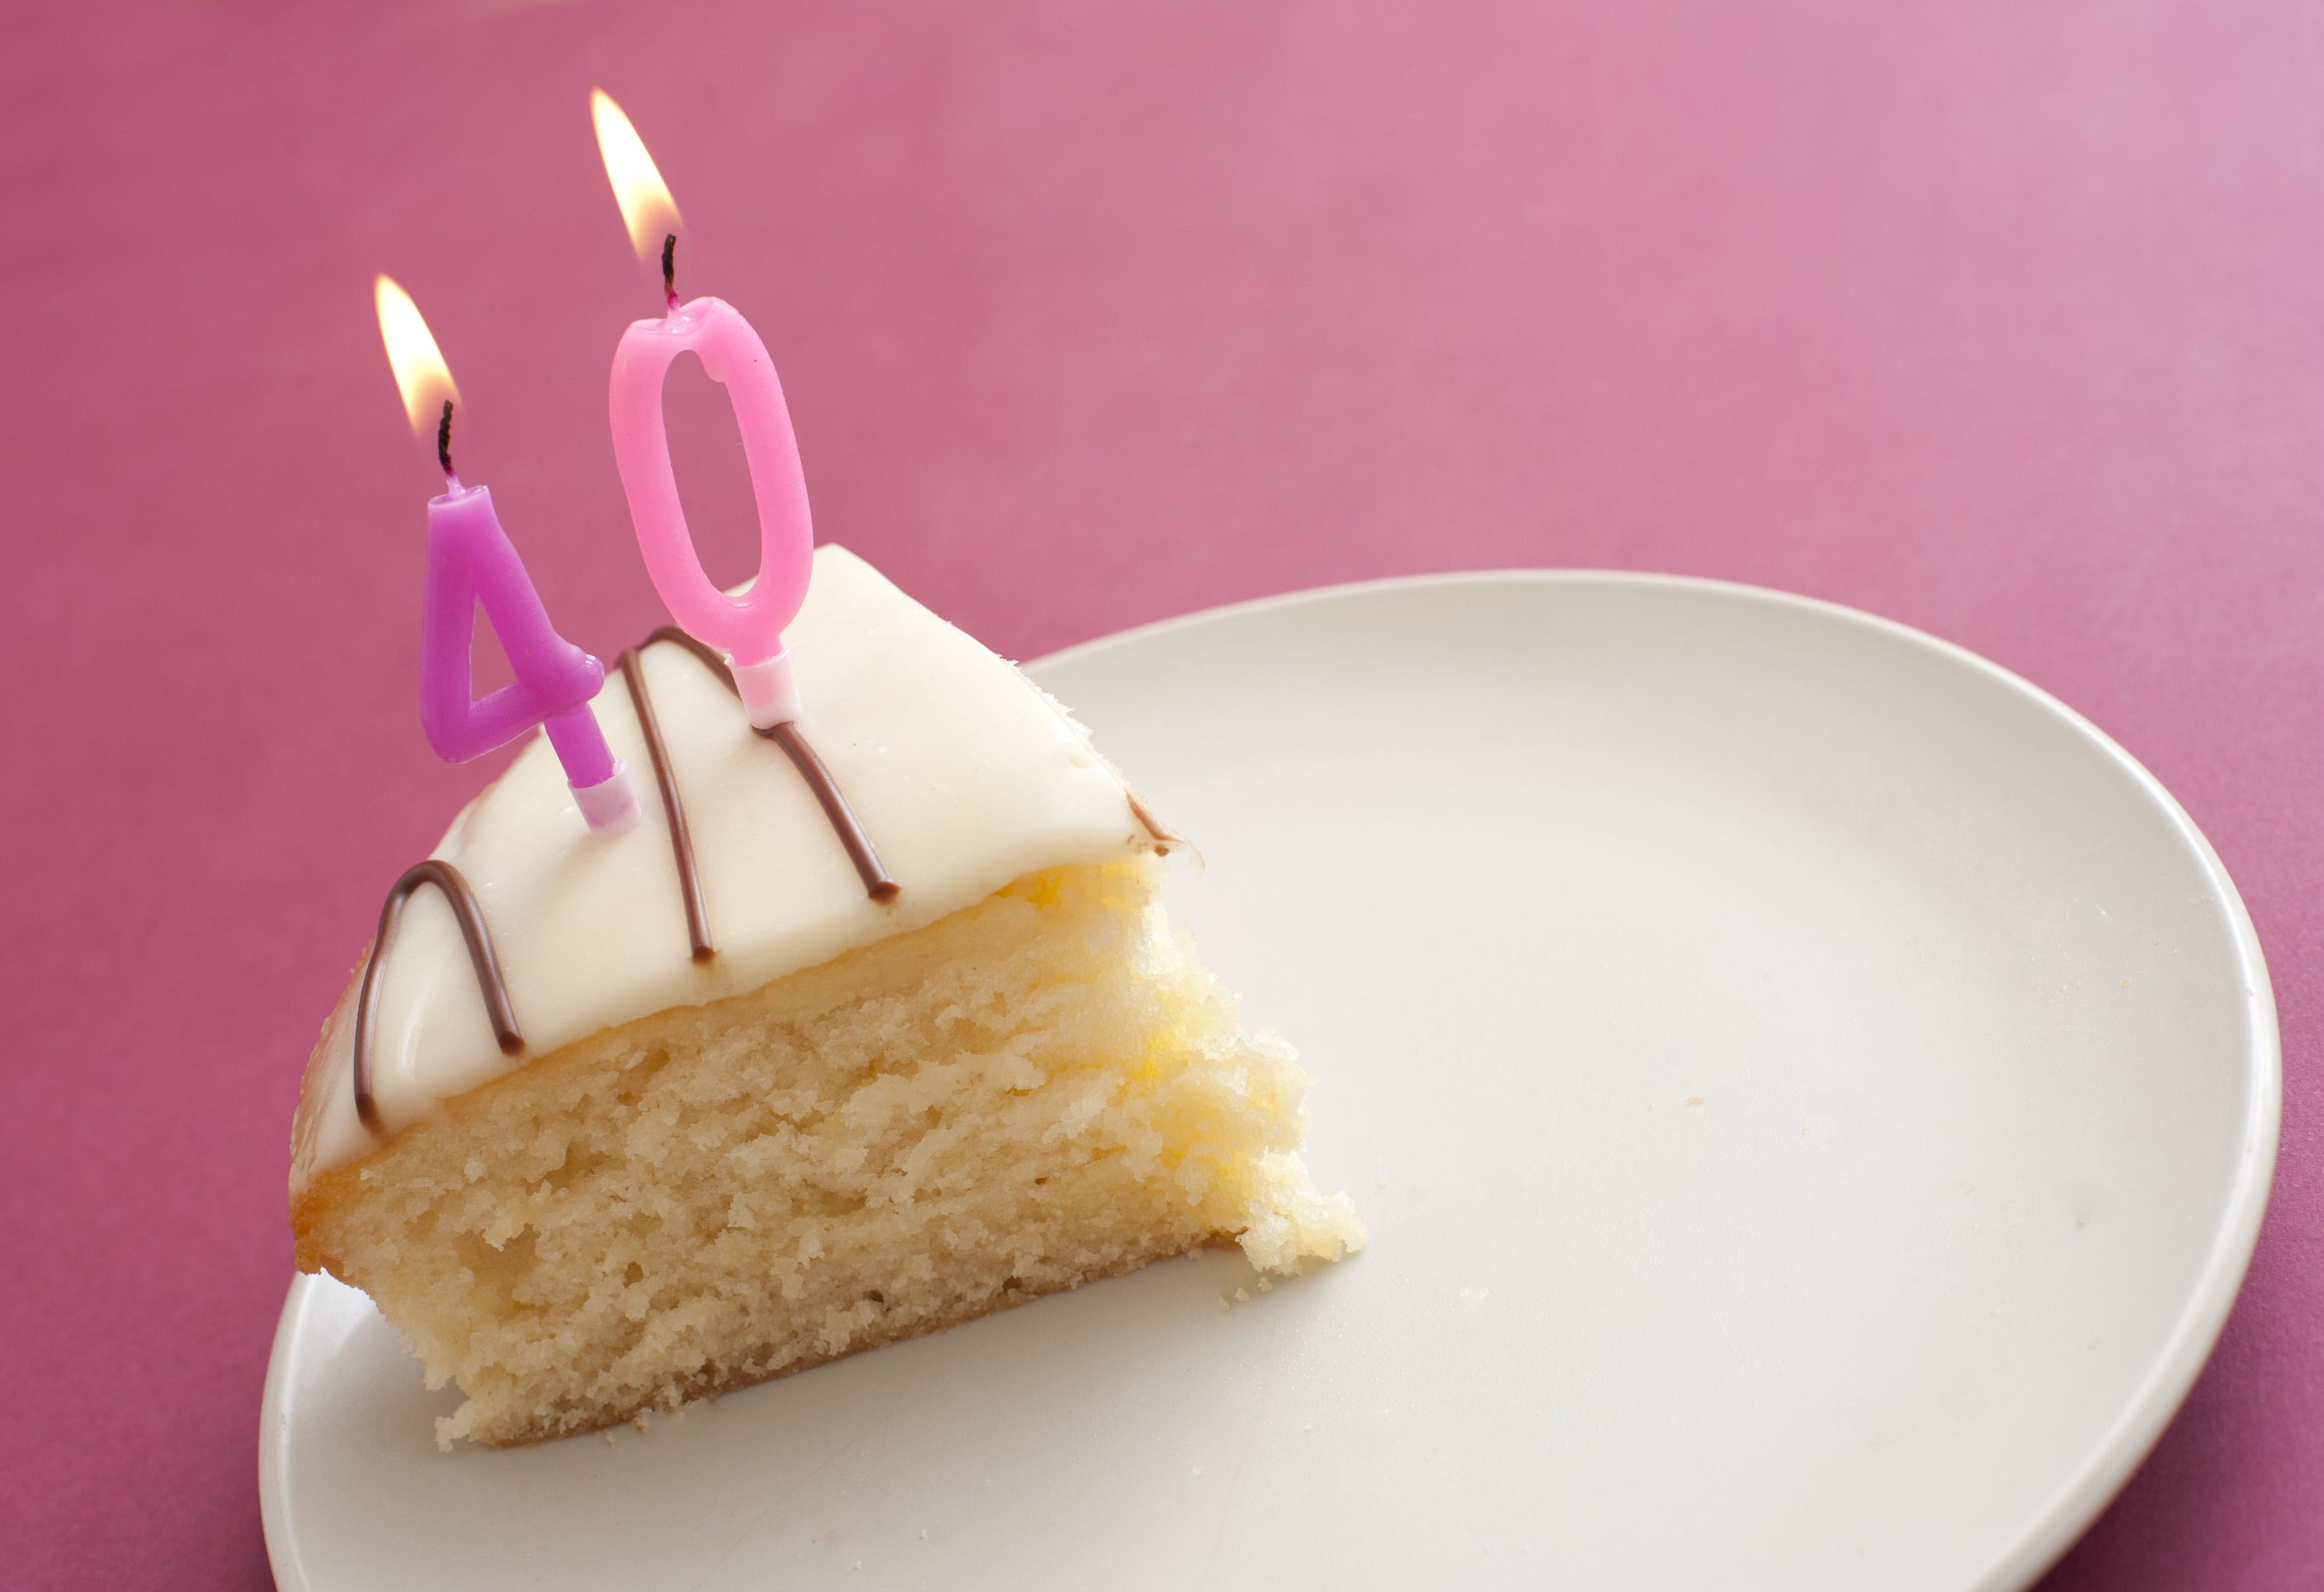 Free Stock Photo 11411 Slice Of 40th Birthday Cake With